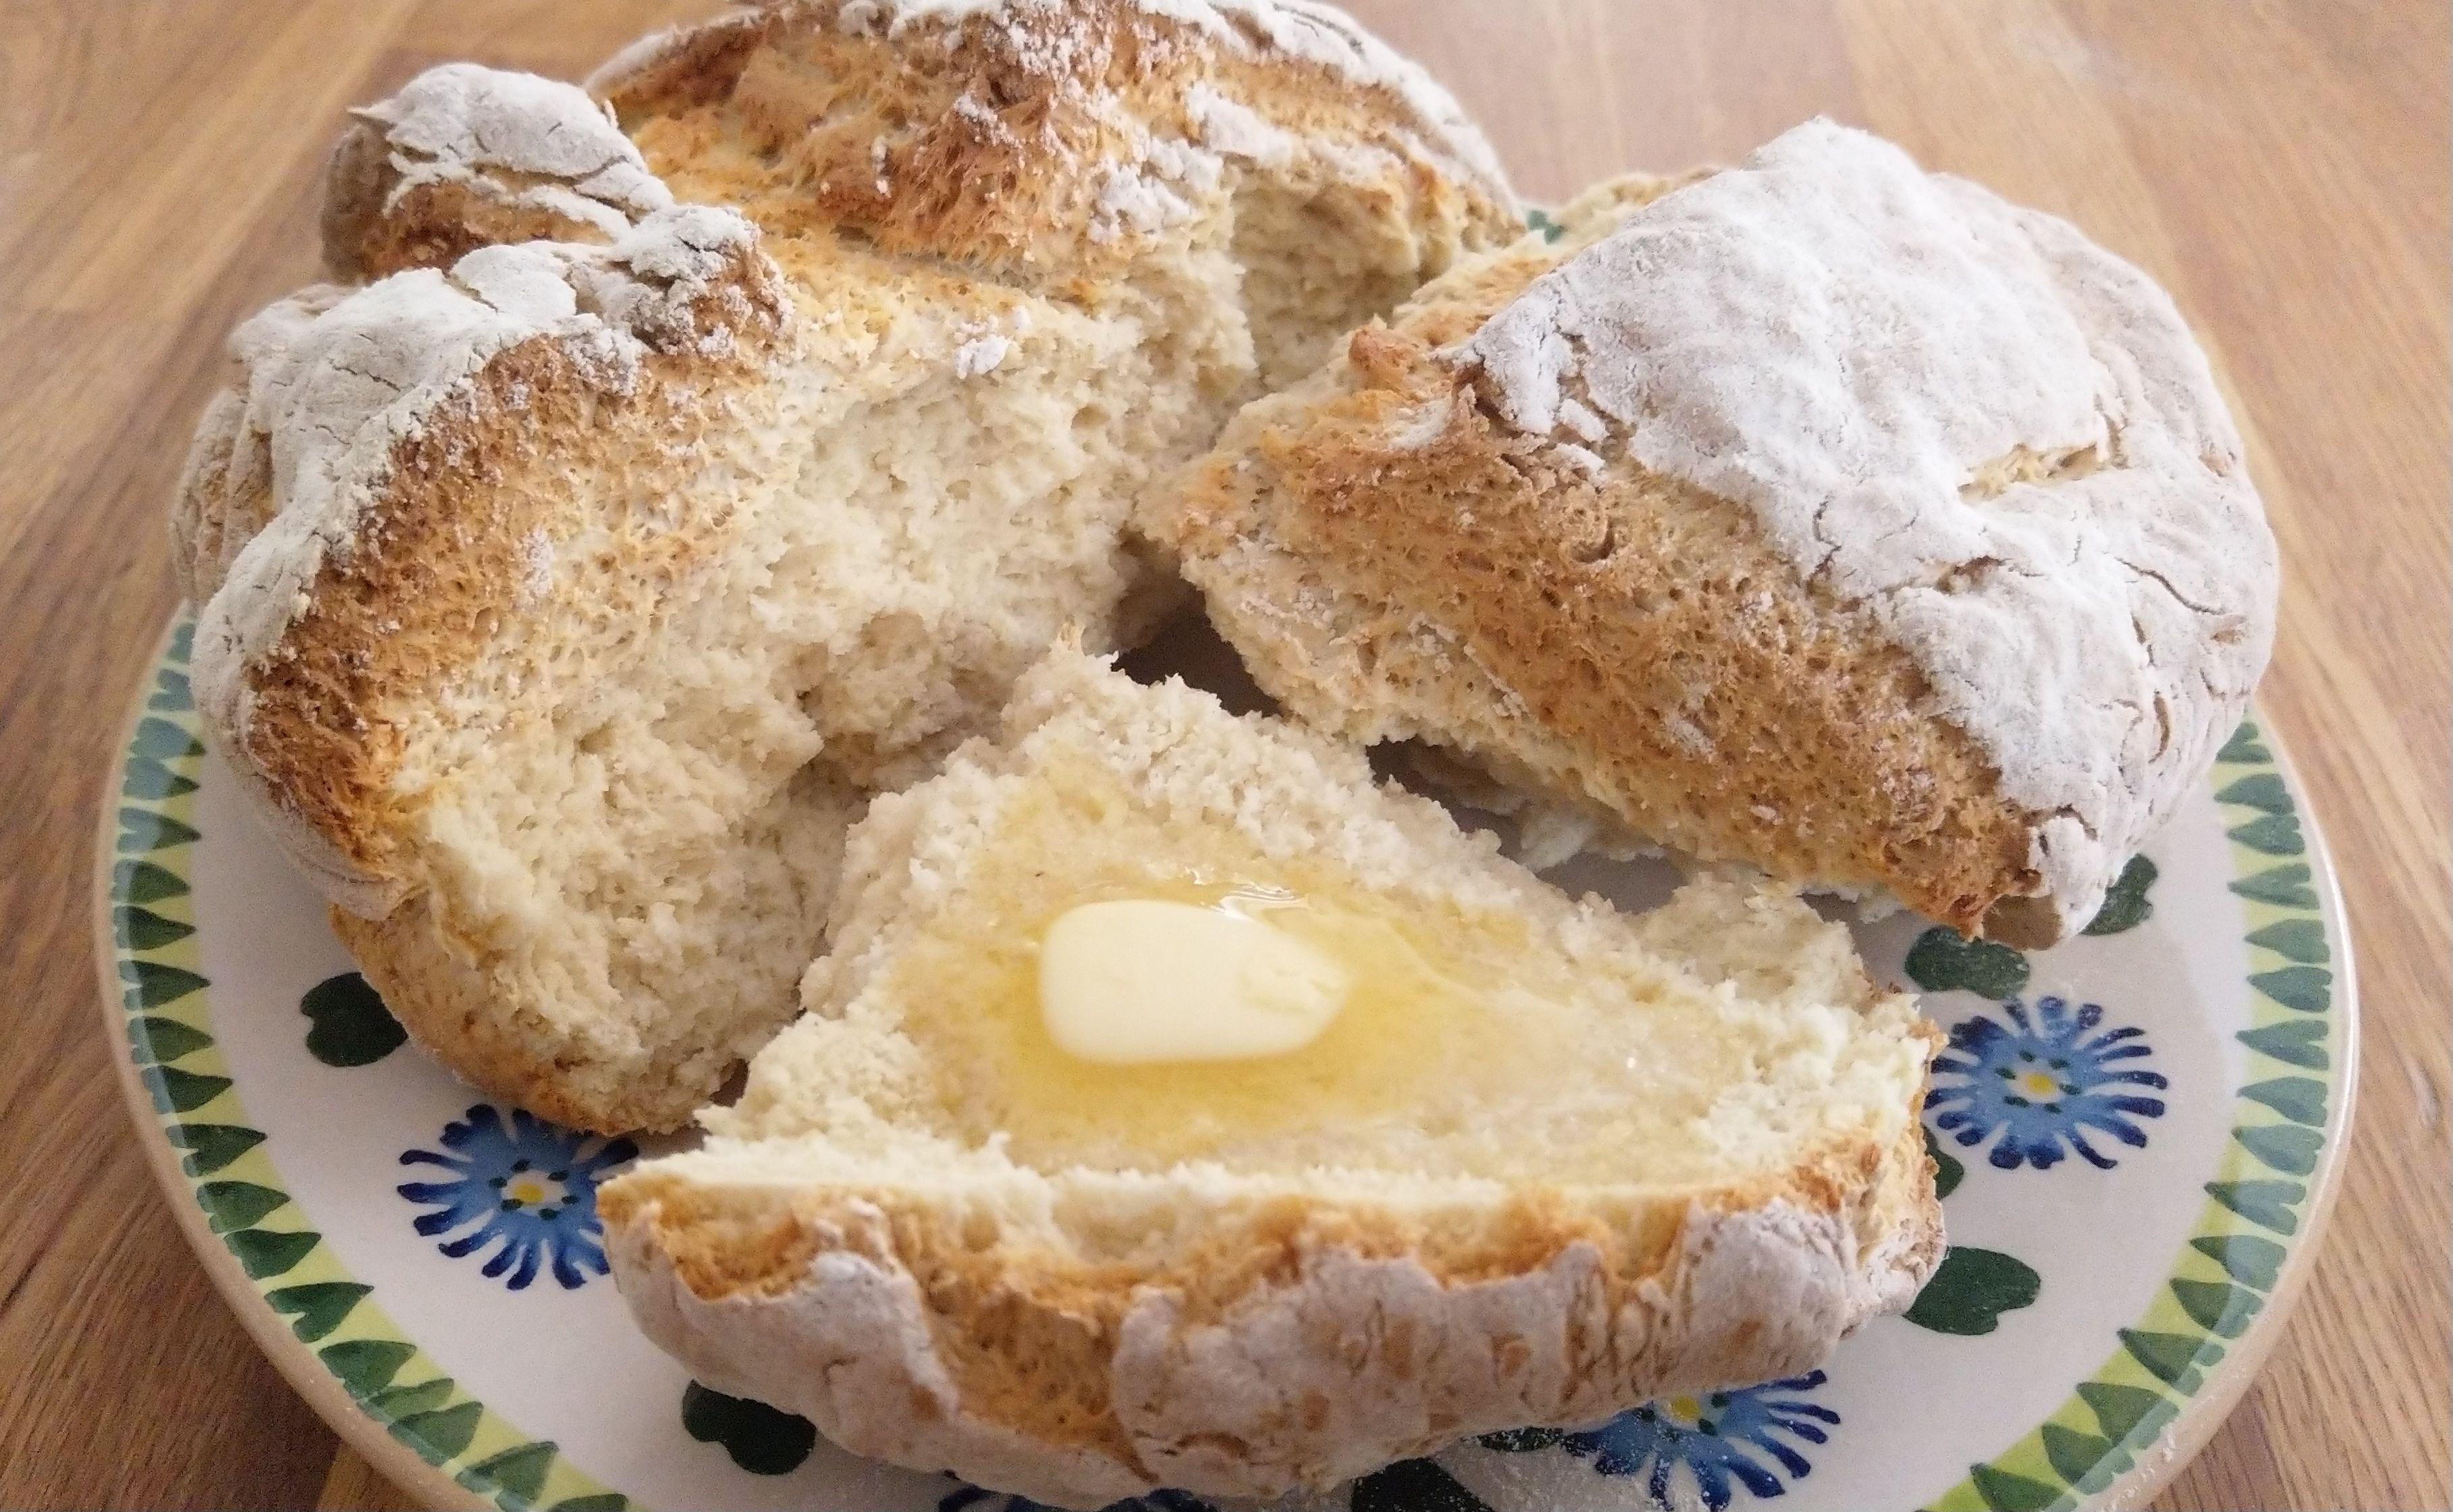 Ireland Traditional Irish Soda Bread Without Buttermilk European Cuisines Irish Soda Bread Soda Bread Without Buttermilk Traditional Irish Soda Bread